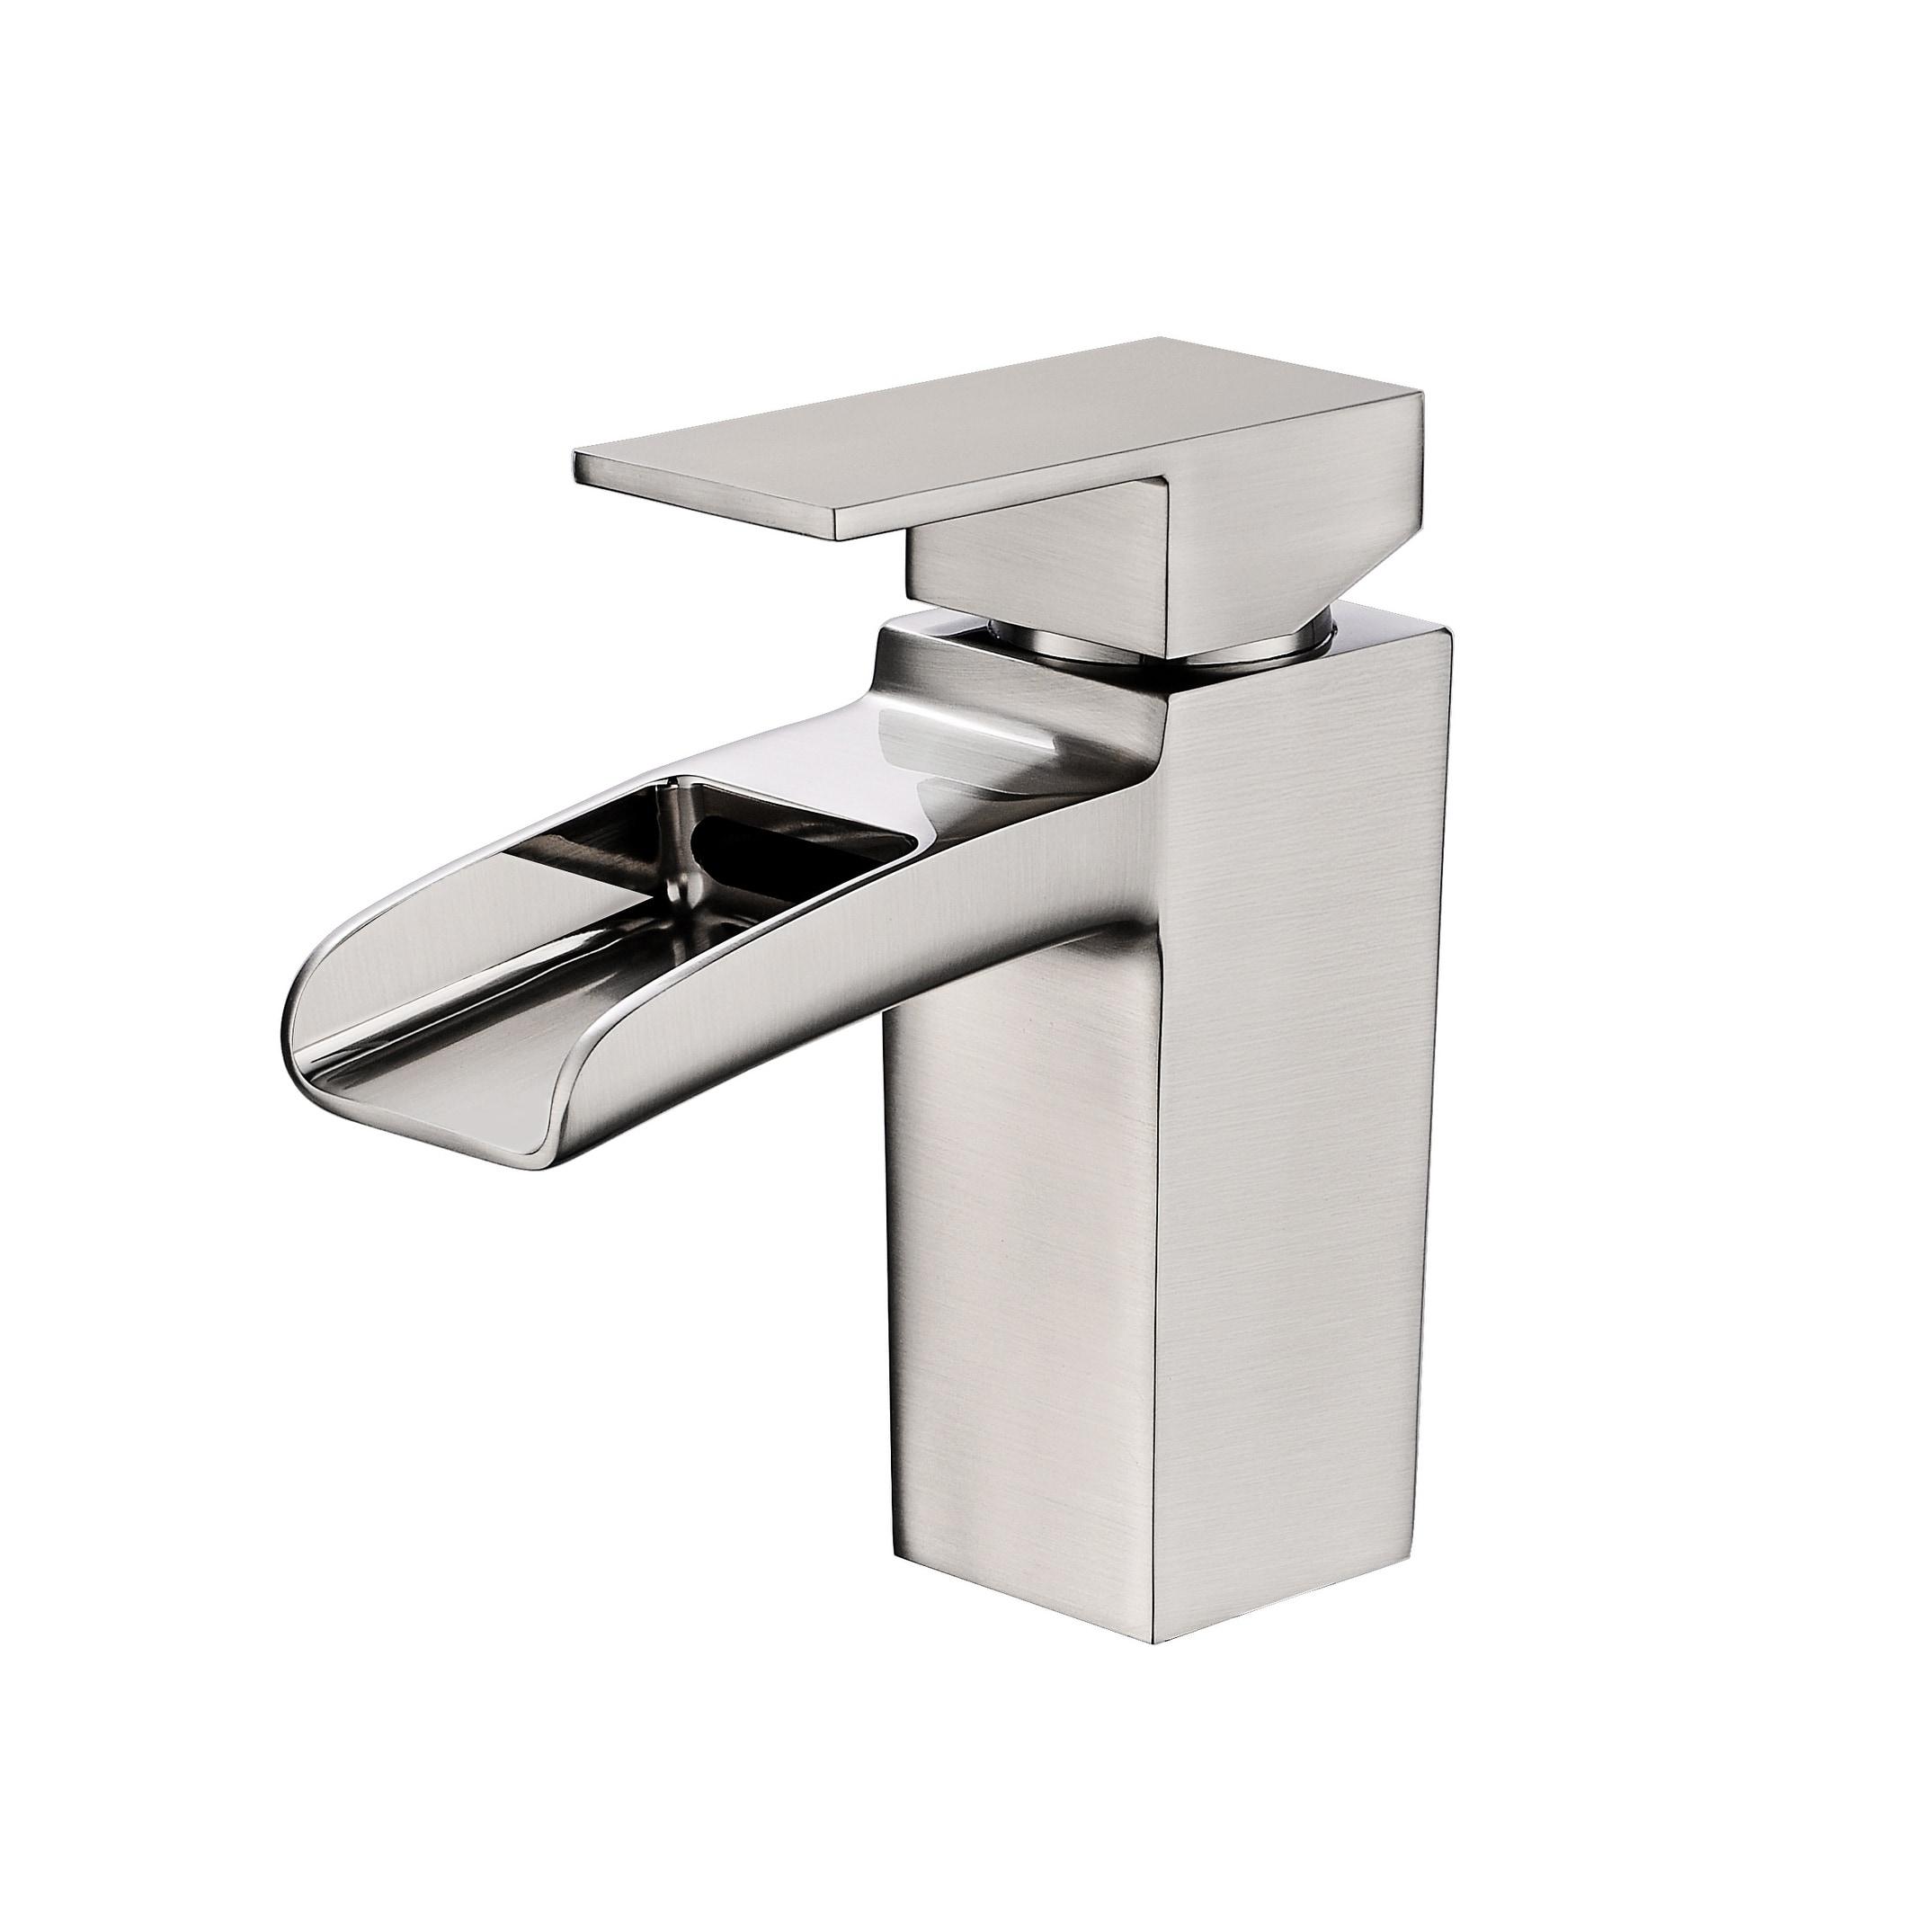 Shop Black Friday Deals On Vanity Art 6 Inch Waterfall Spout Bathroom Vessel Sink Faucet Single Handle Single Hole Basin Tap Deck Mount Brushed Nickel Overstock 27119648